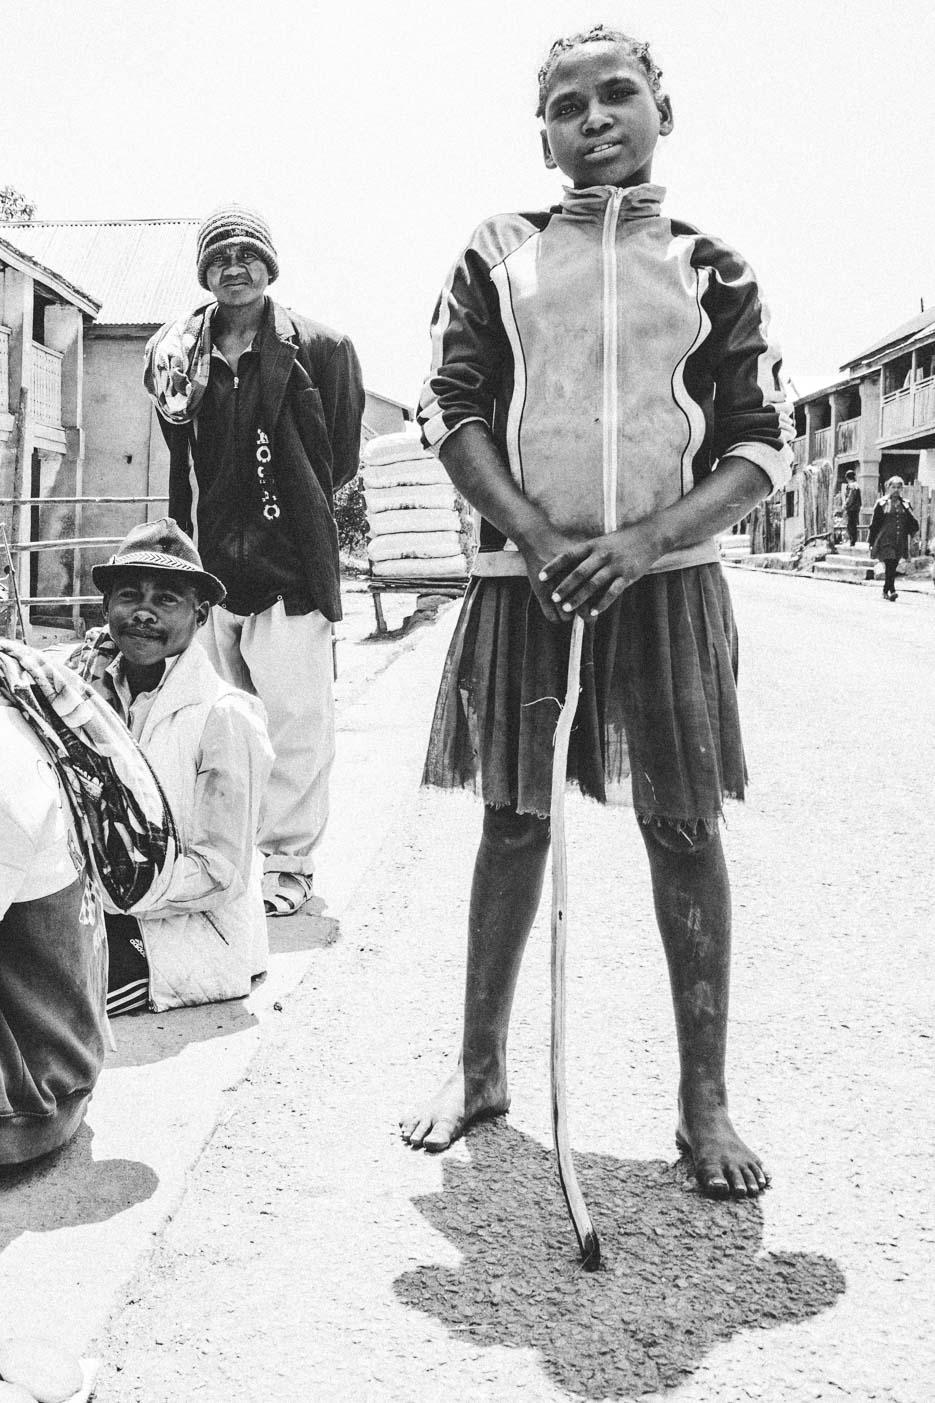 madagaskar Menschen fotografie betsileo